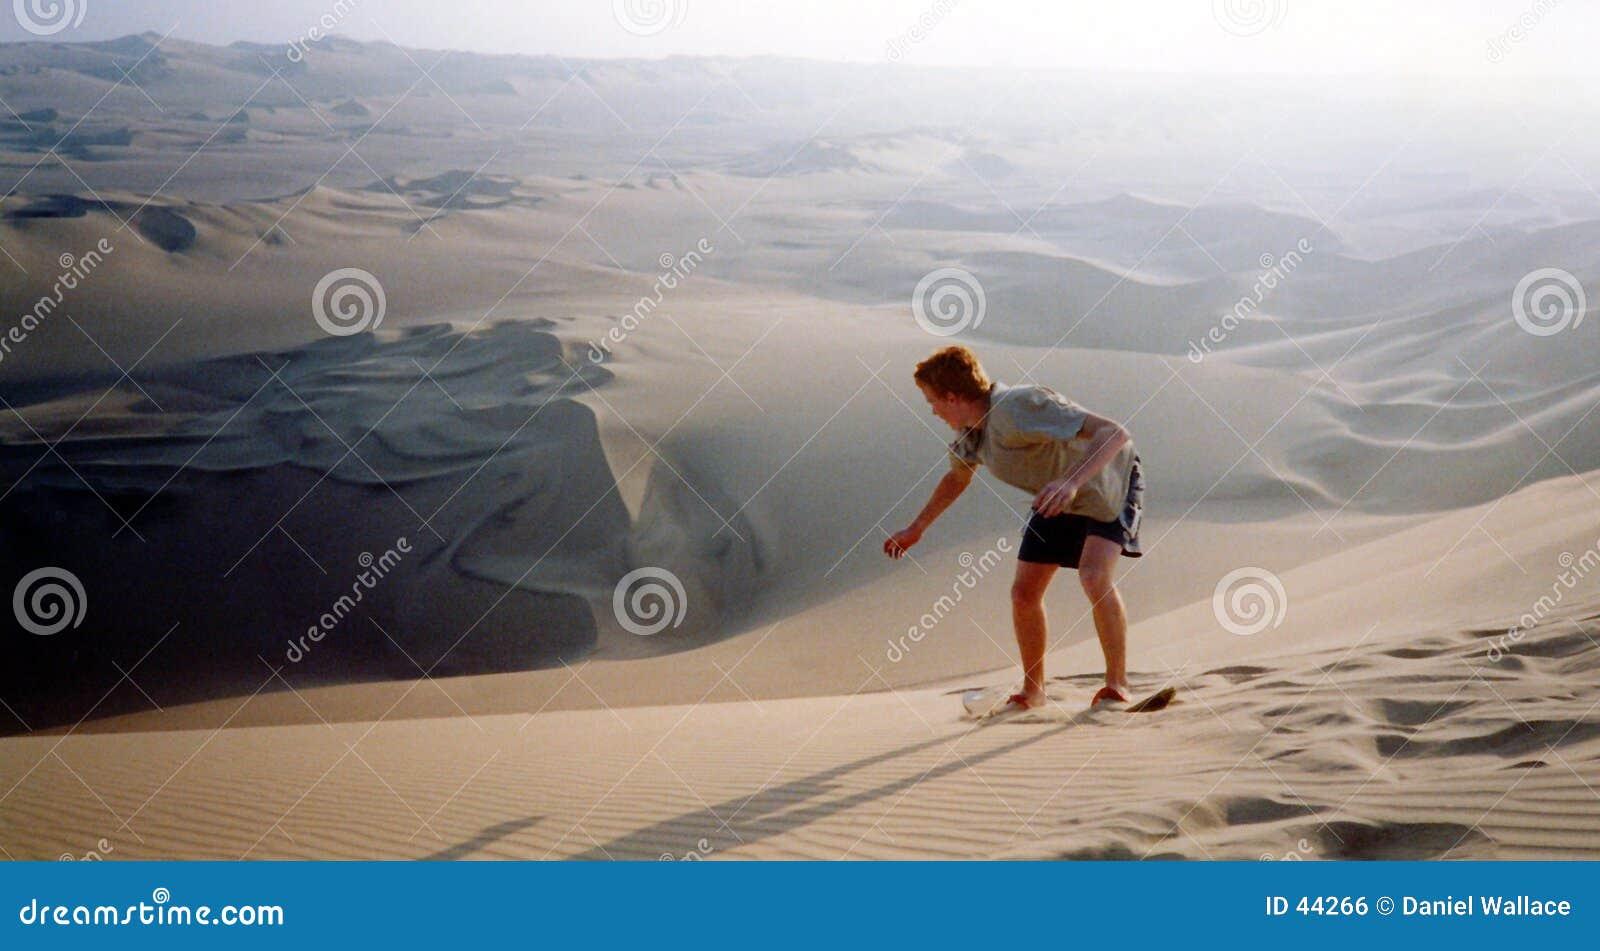 Sandboarding Wüste